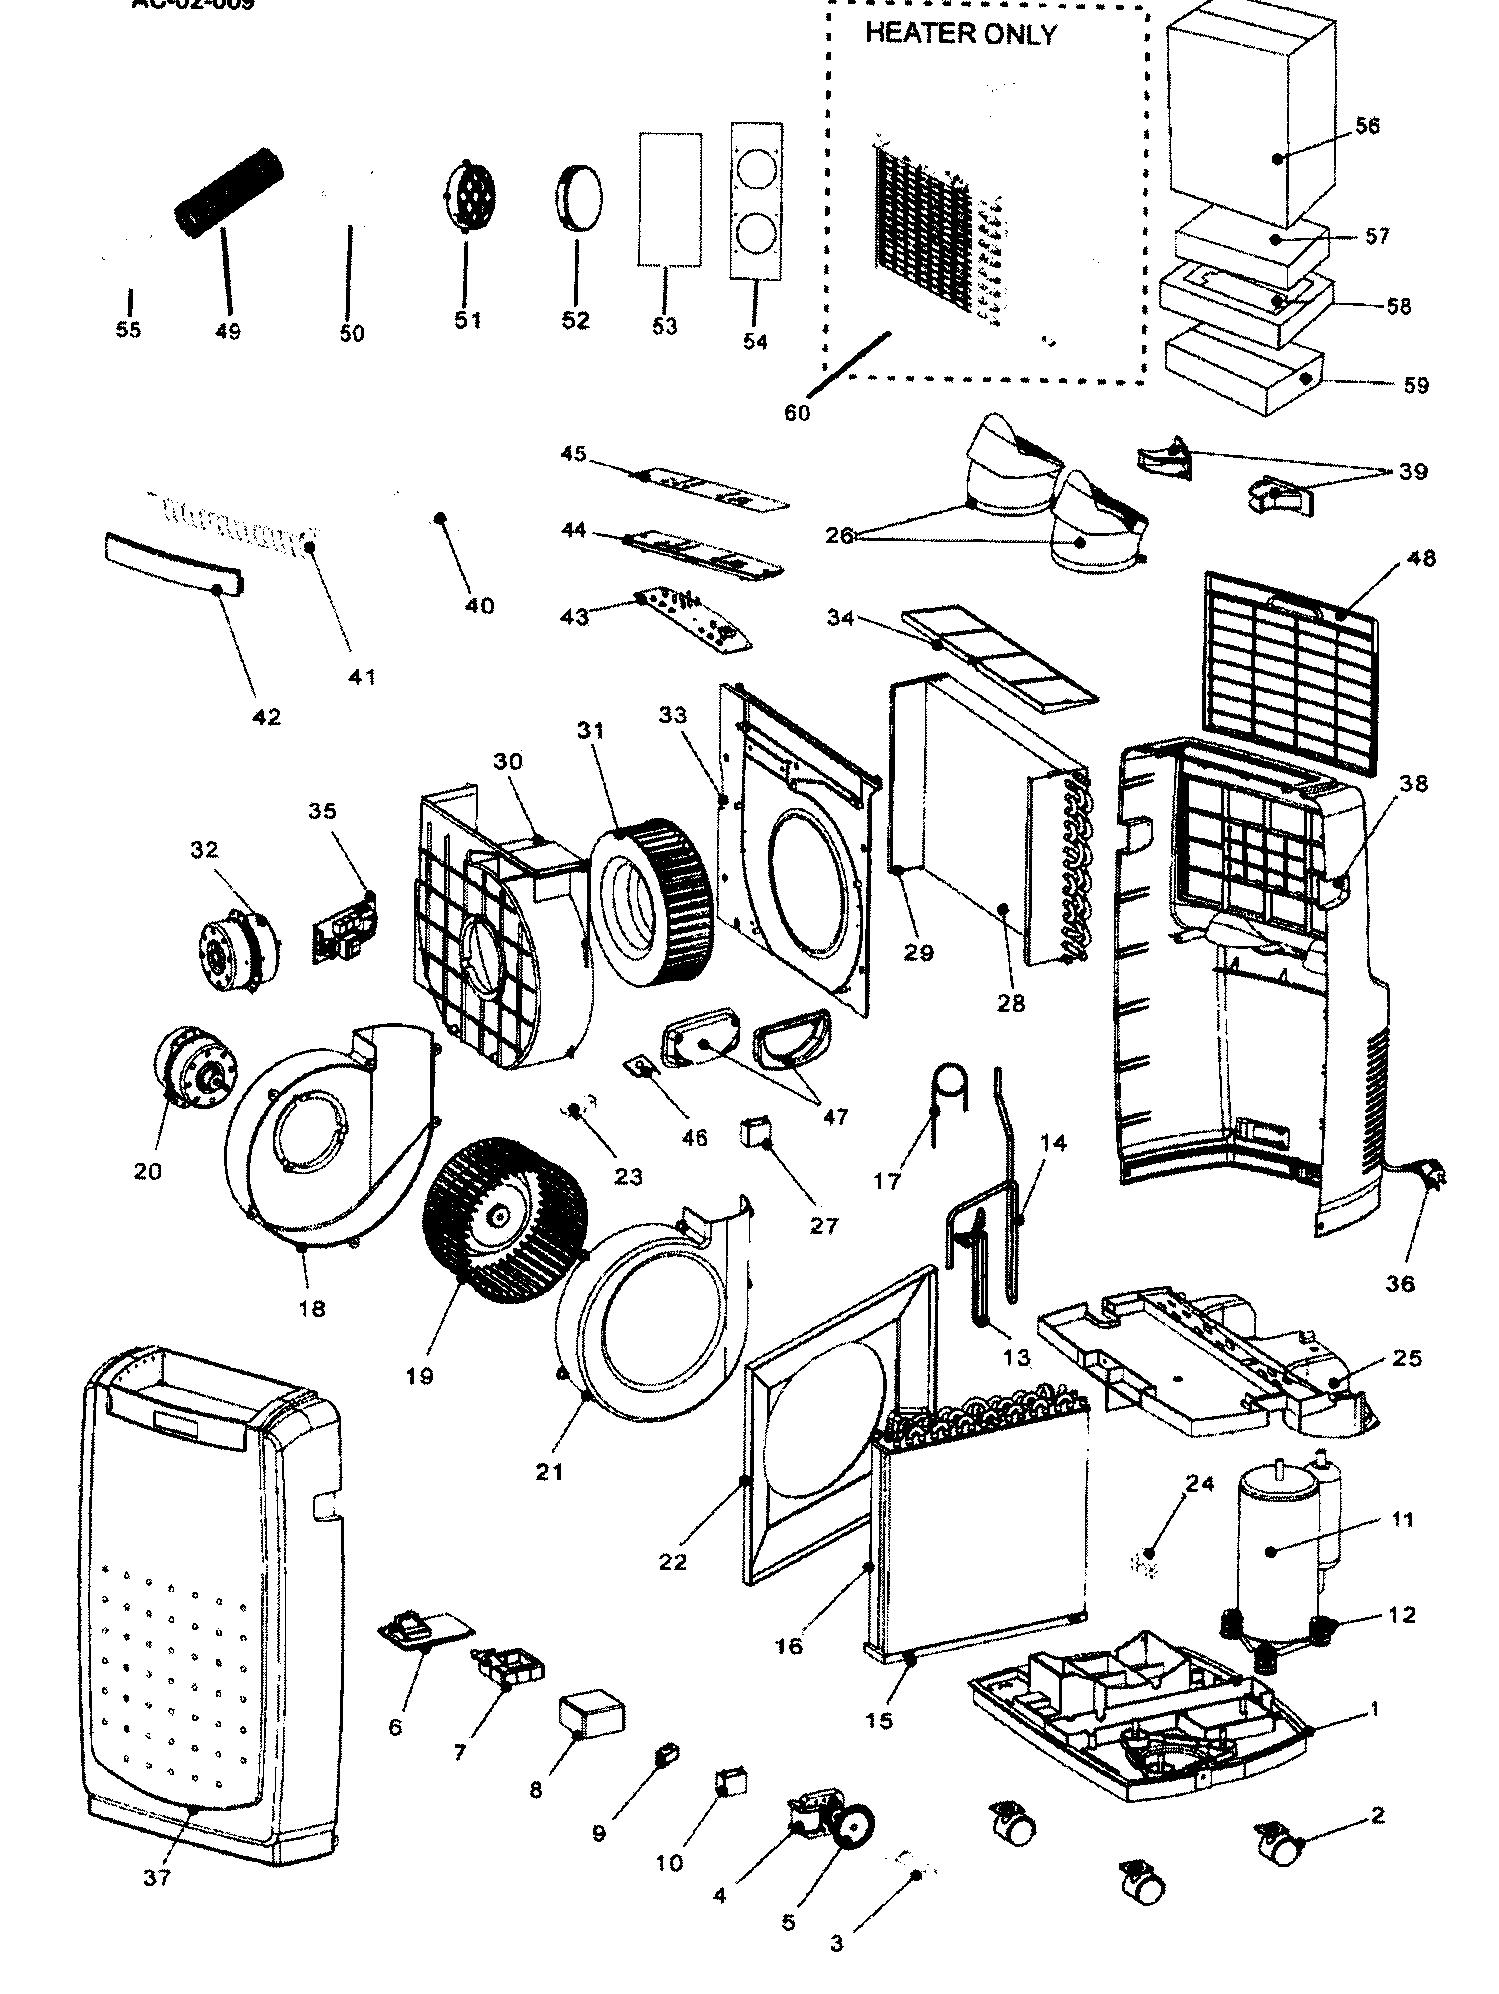 Lg Portable Air Conditioner Model Lp1411shr Wiring Diagram